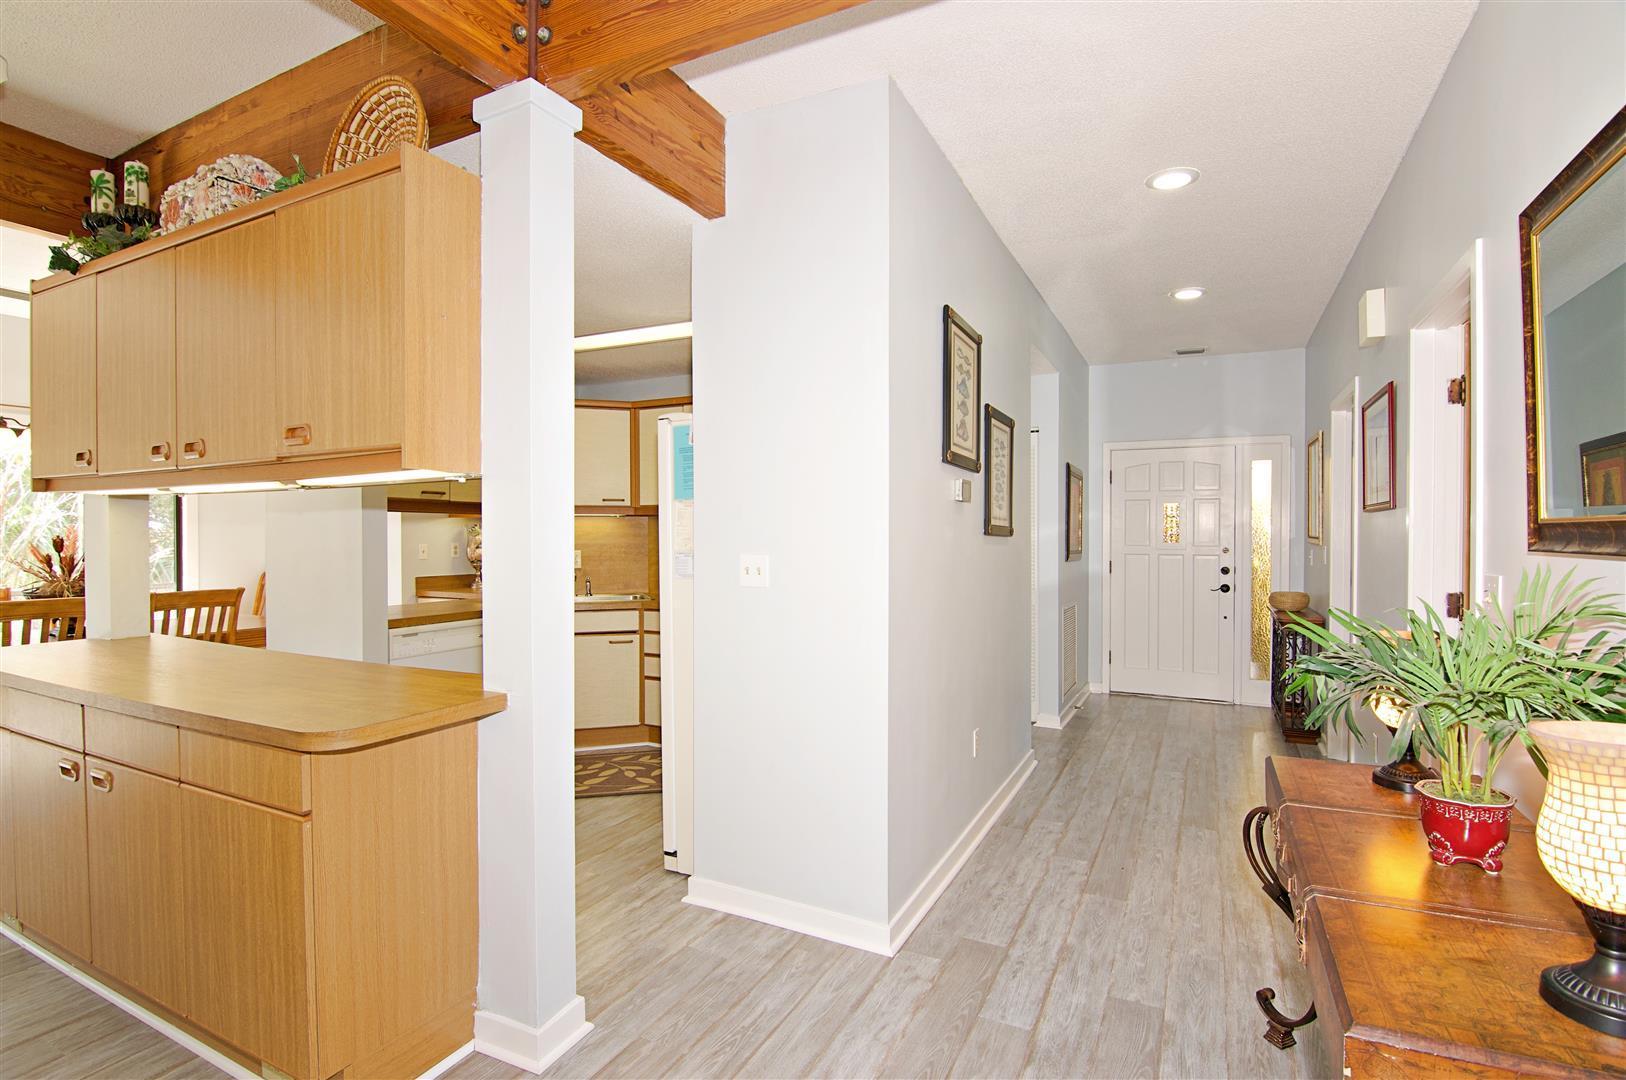 Seabrook Island Homes For Sale - 3020 Ocean Winds, Seabrook Island, SC - 6